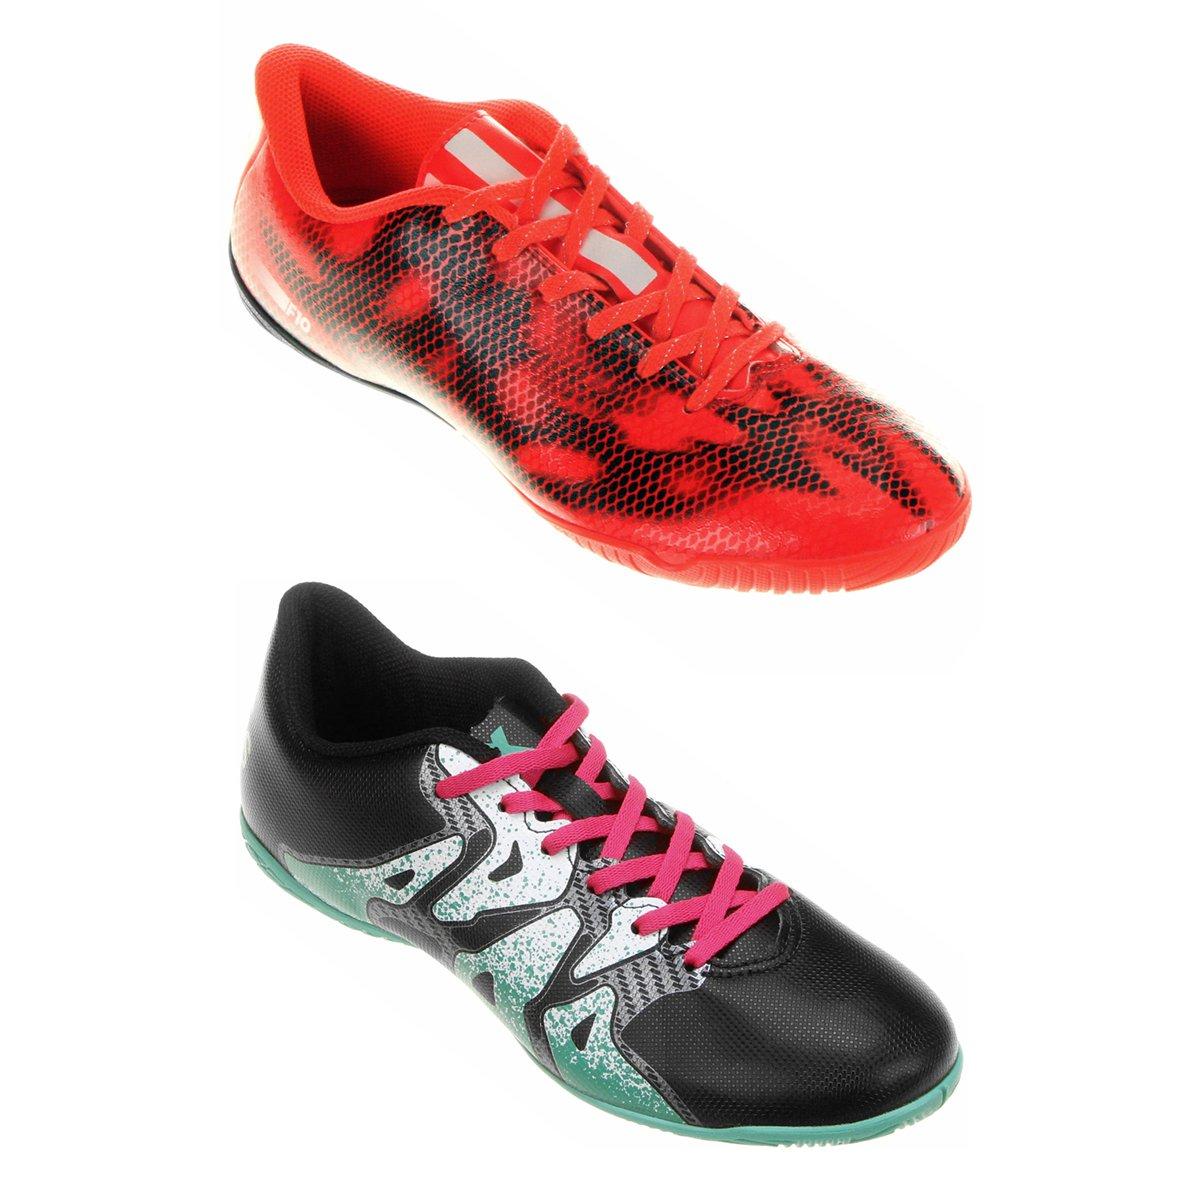 Kit Chuteira Adidas X 15 4 IN Futsal + Chuteira Adidas F10 IN Futsal -  Compre Agora  8587a6c332969